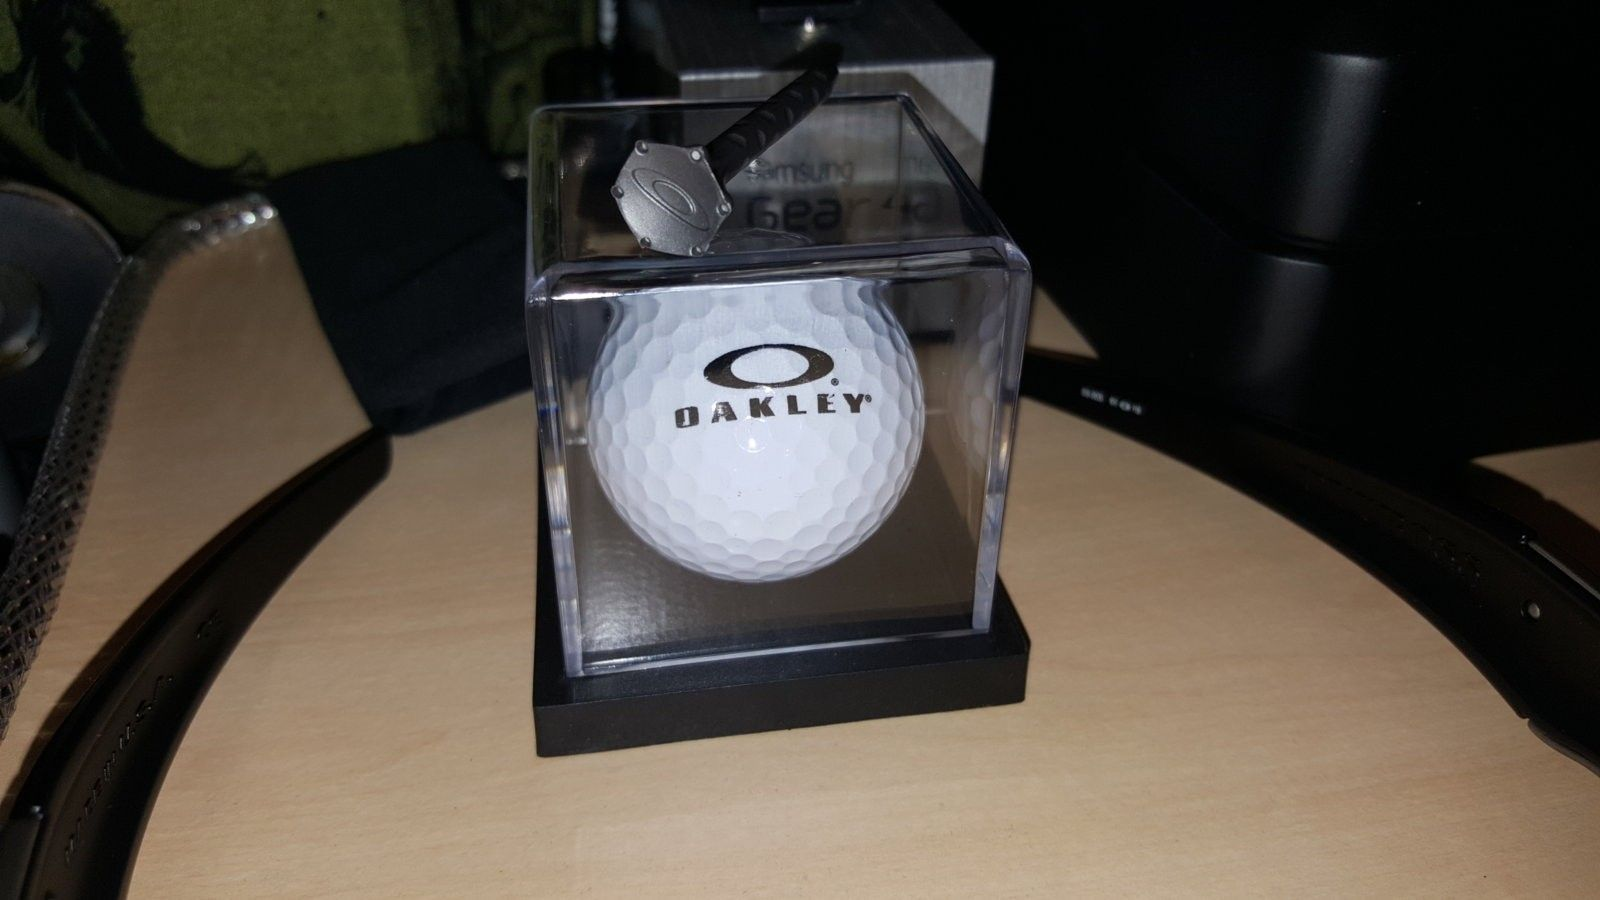 Oakley Golf - 20160219_221451.jpg